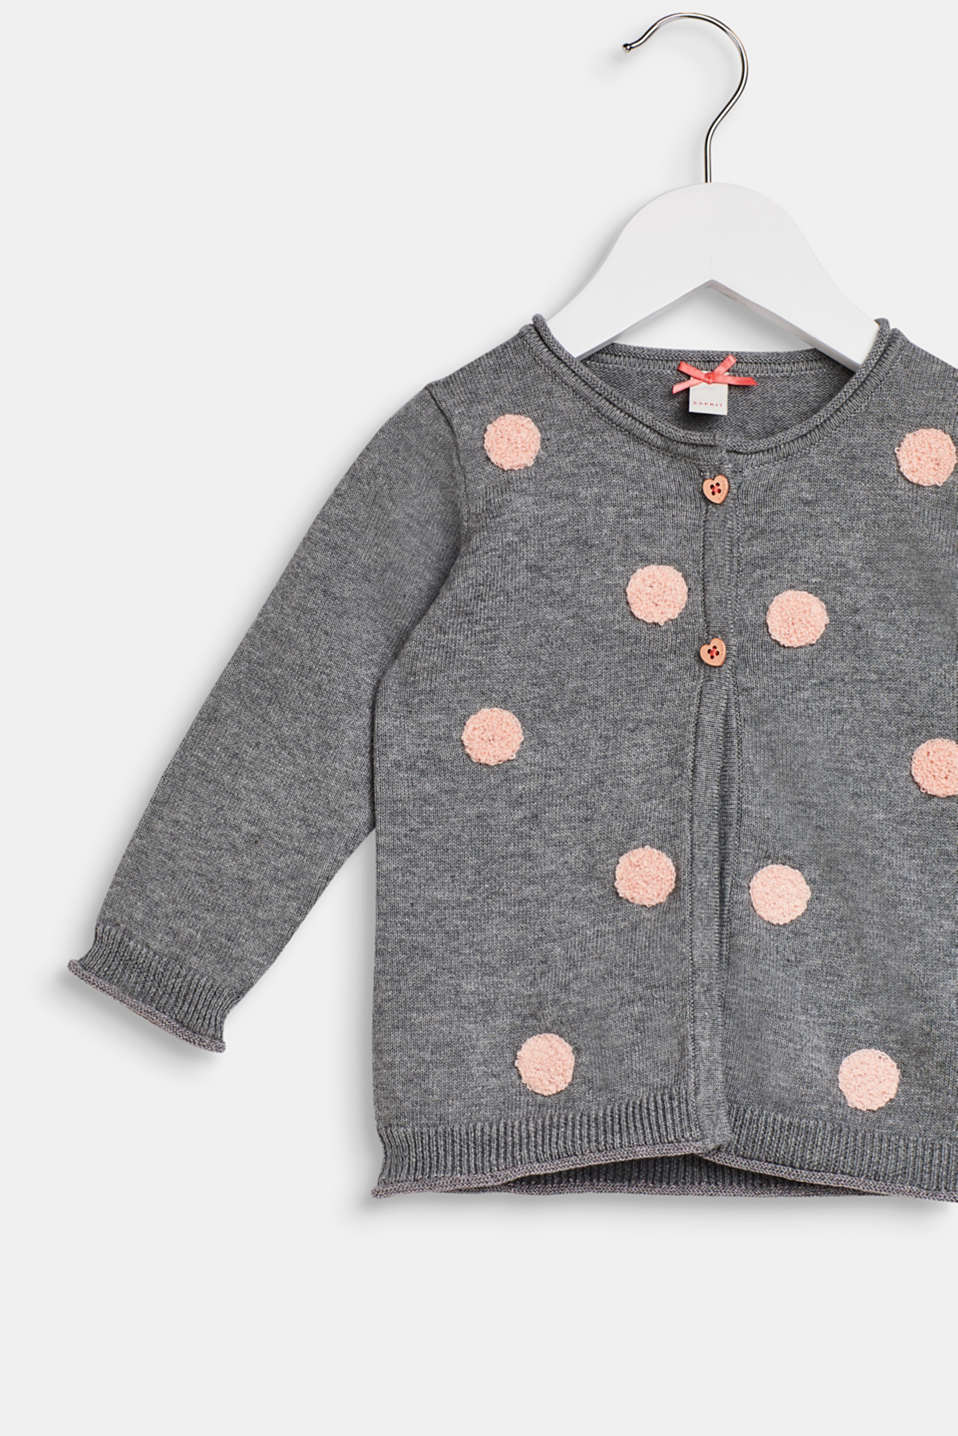 Polka dot-textured cardigan, 100% cotton, LCDARK HEATHER G, detail image number 2